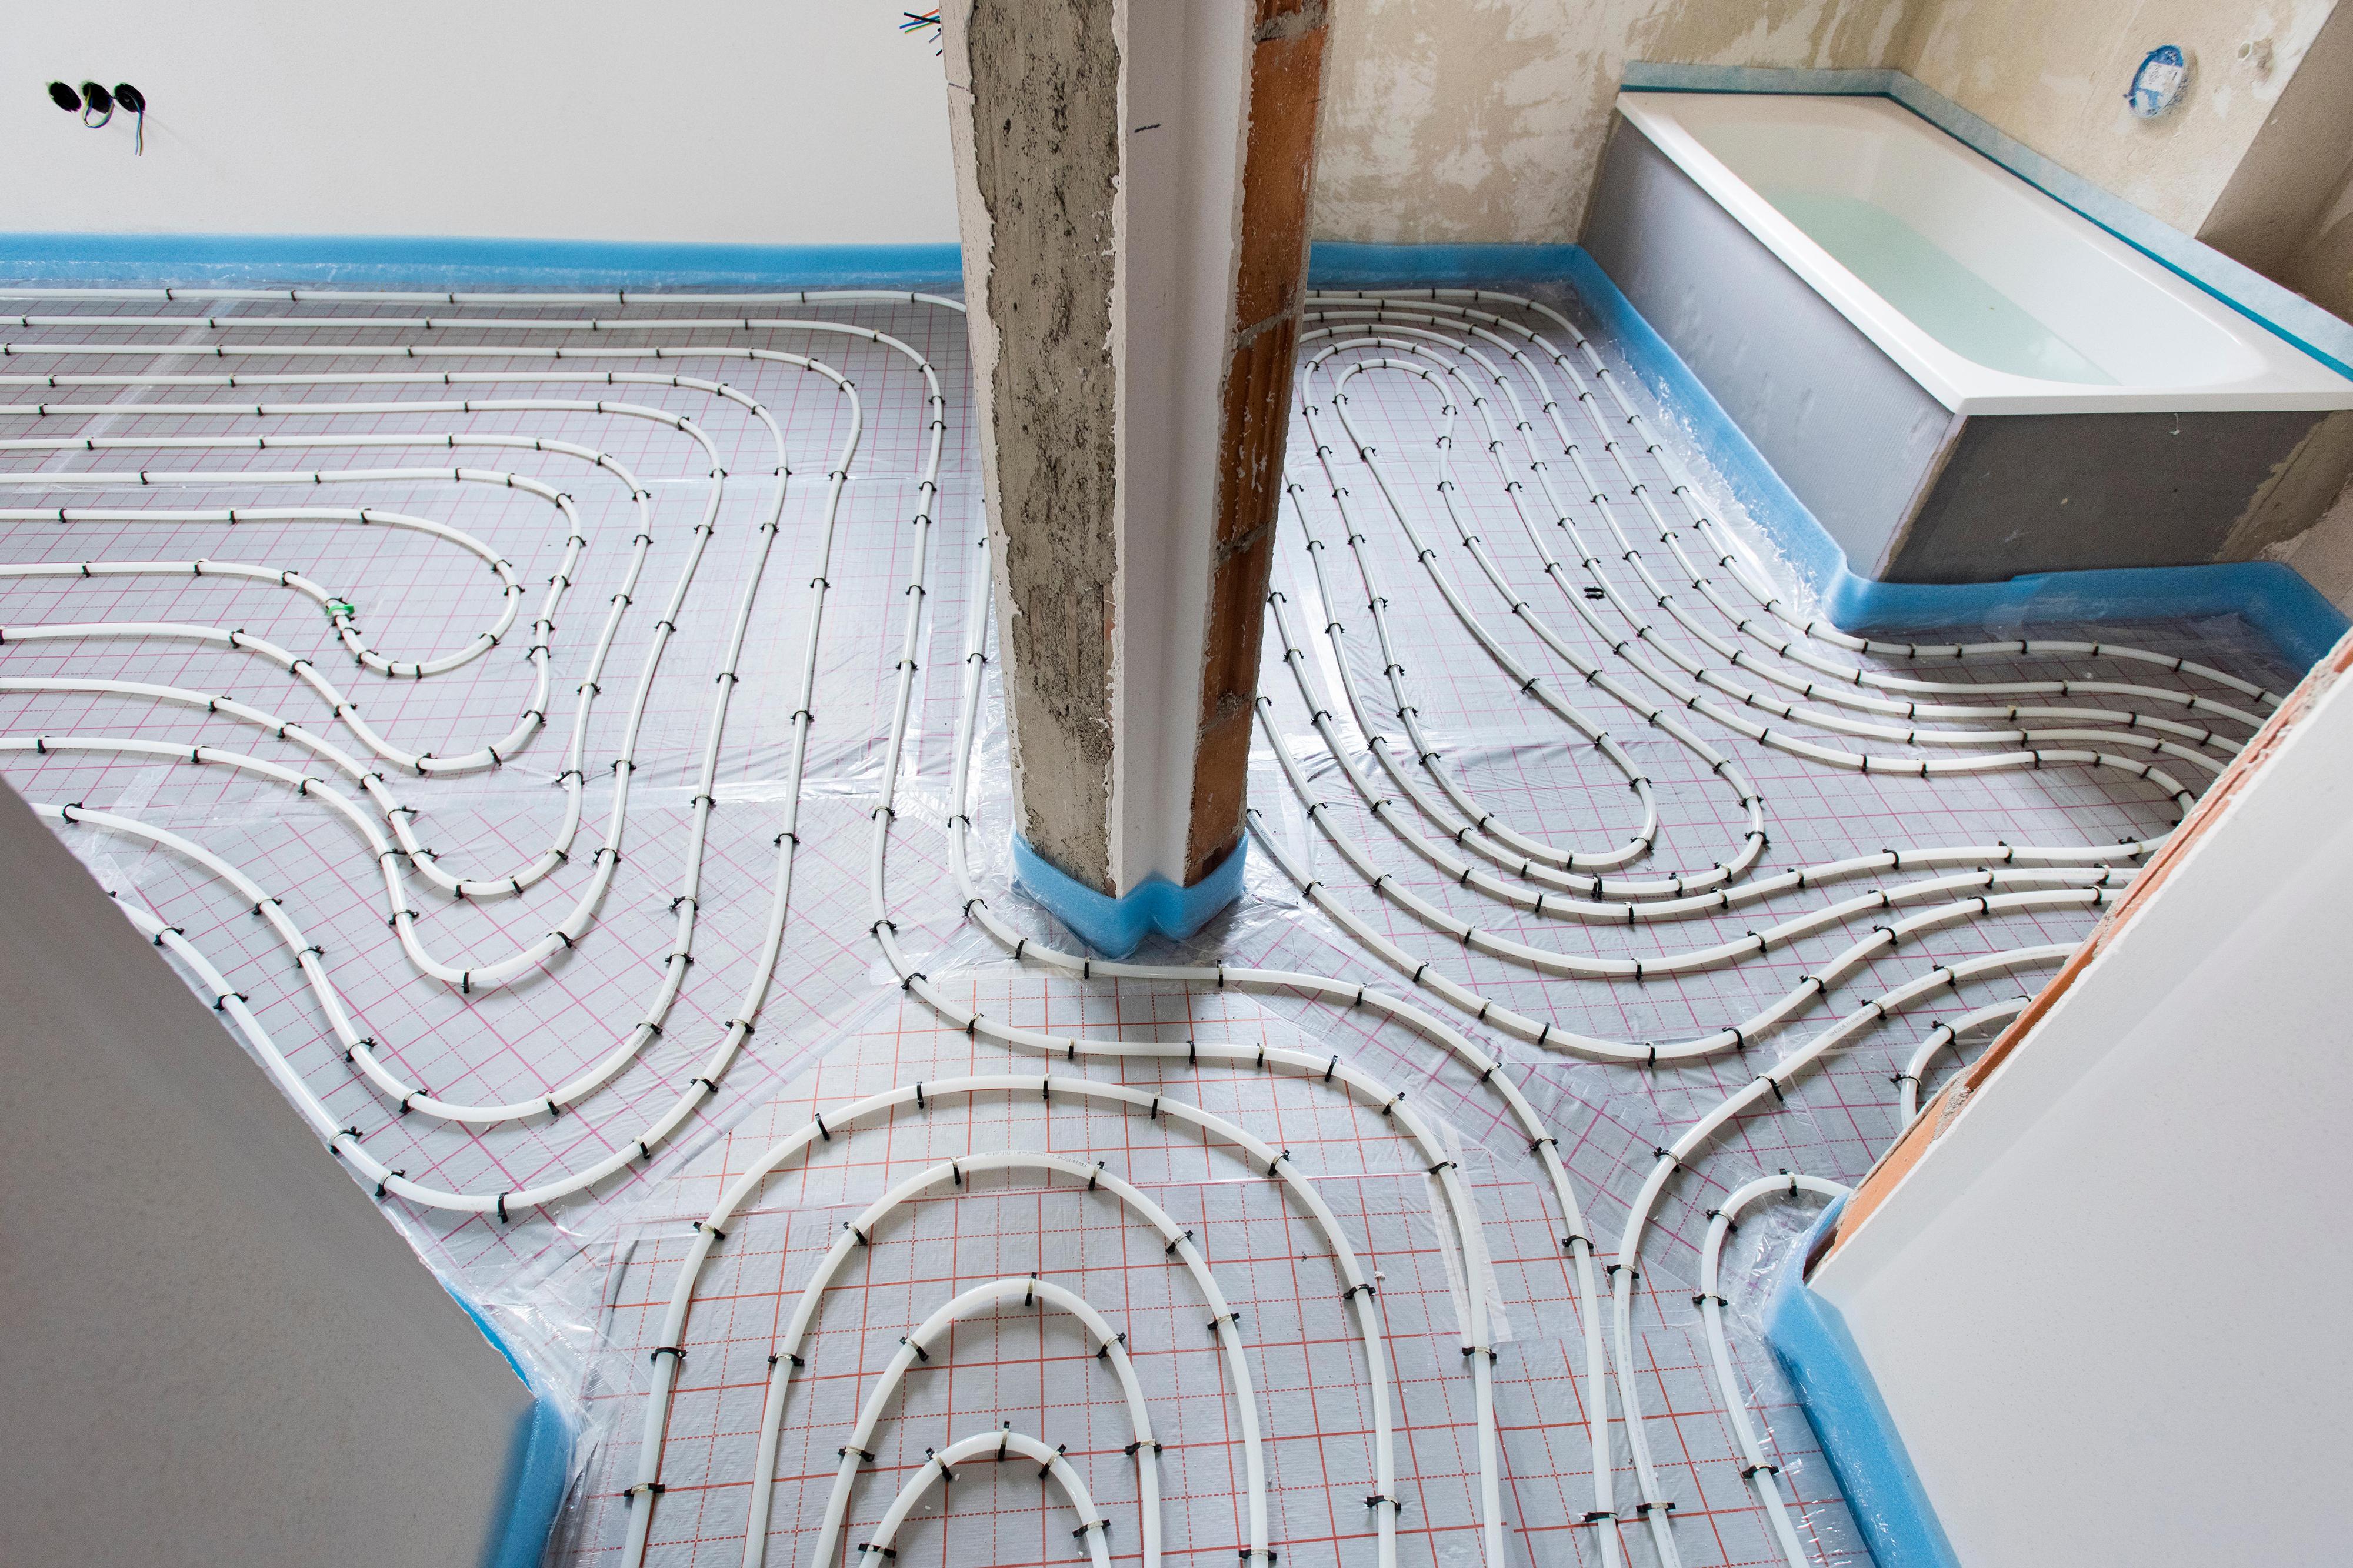 Radiant floor heating installed in bathroom.